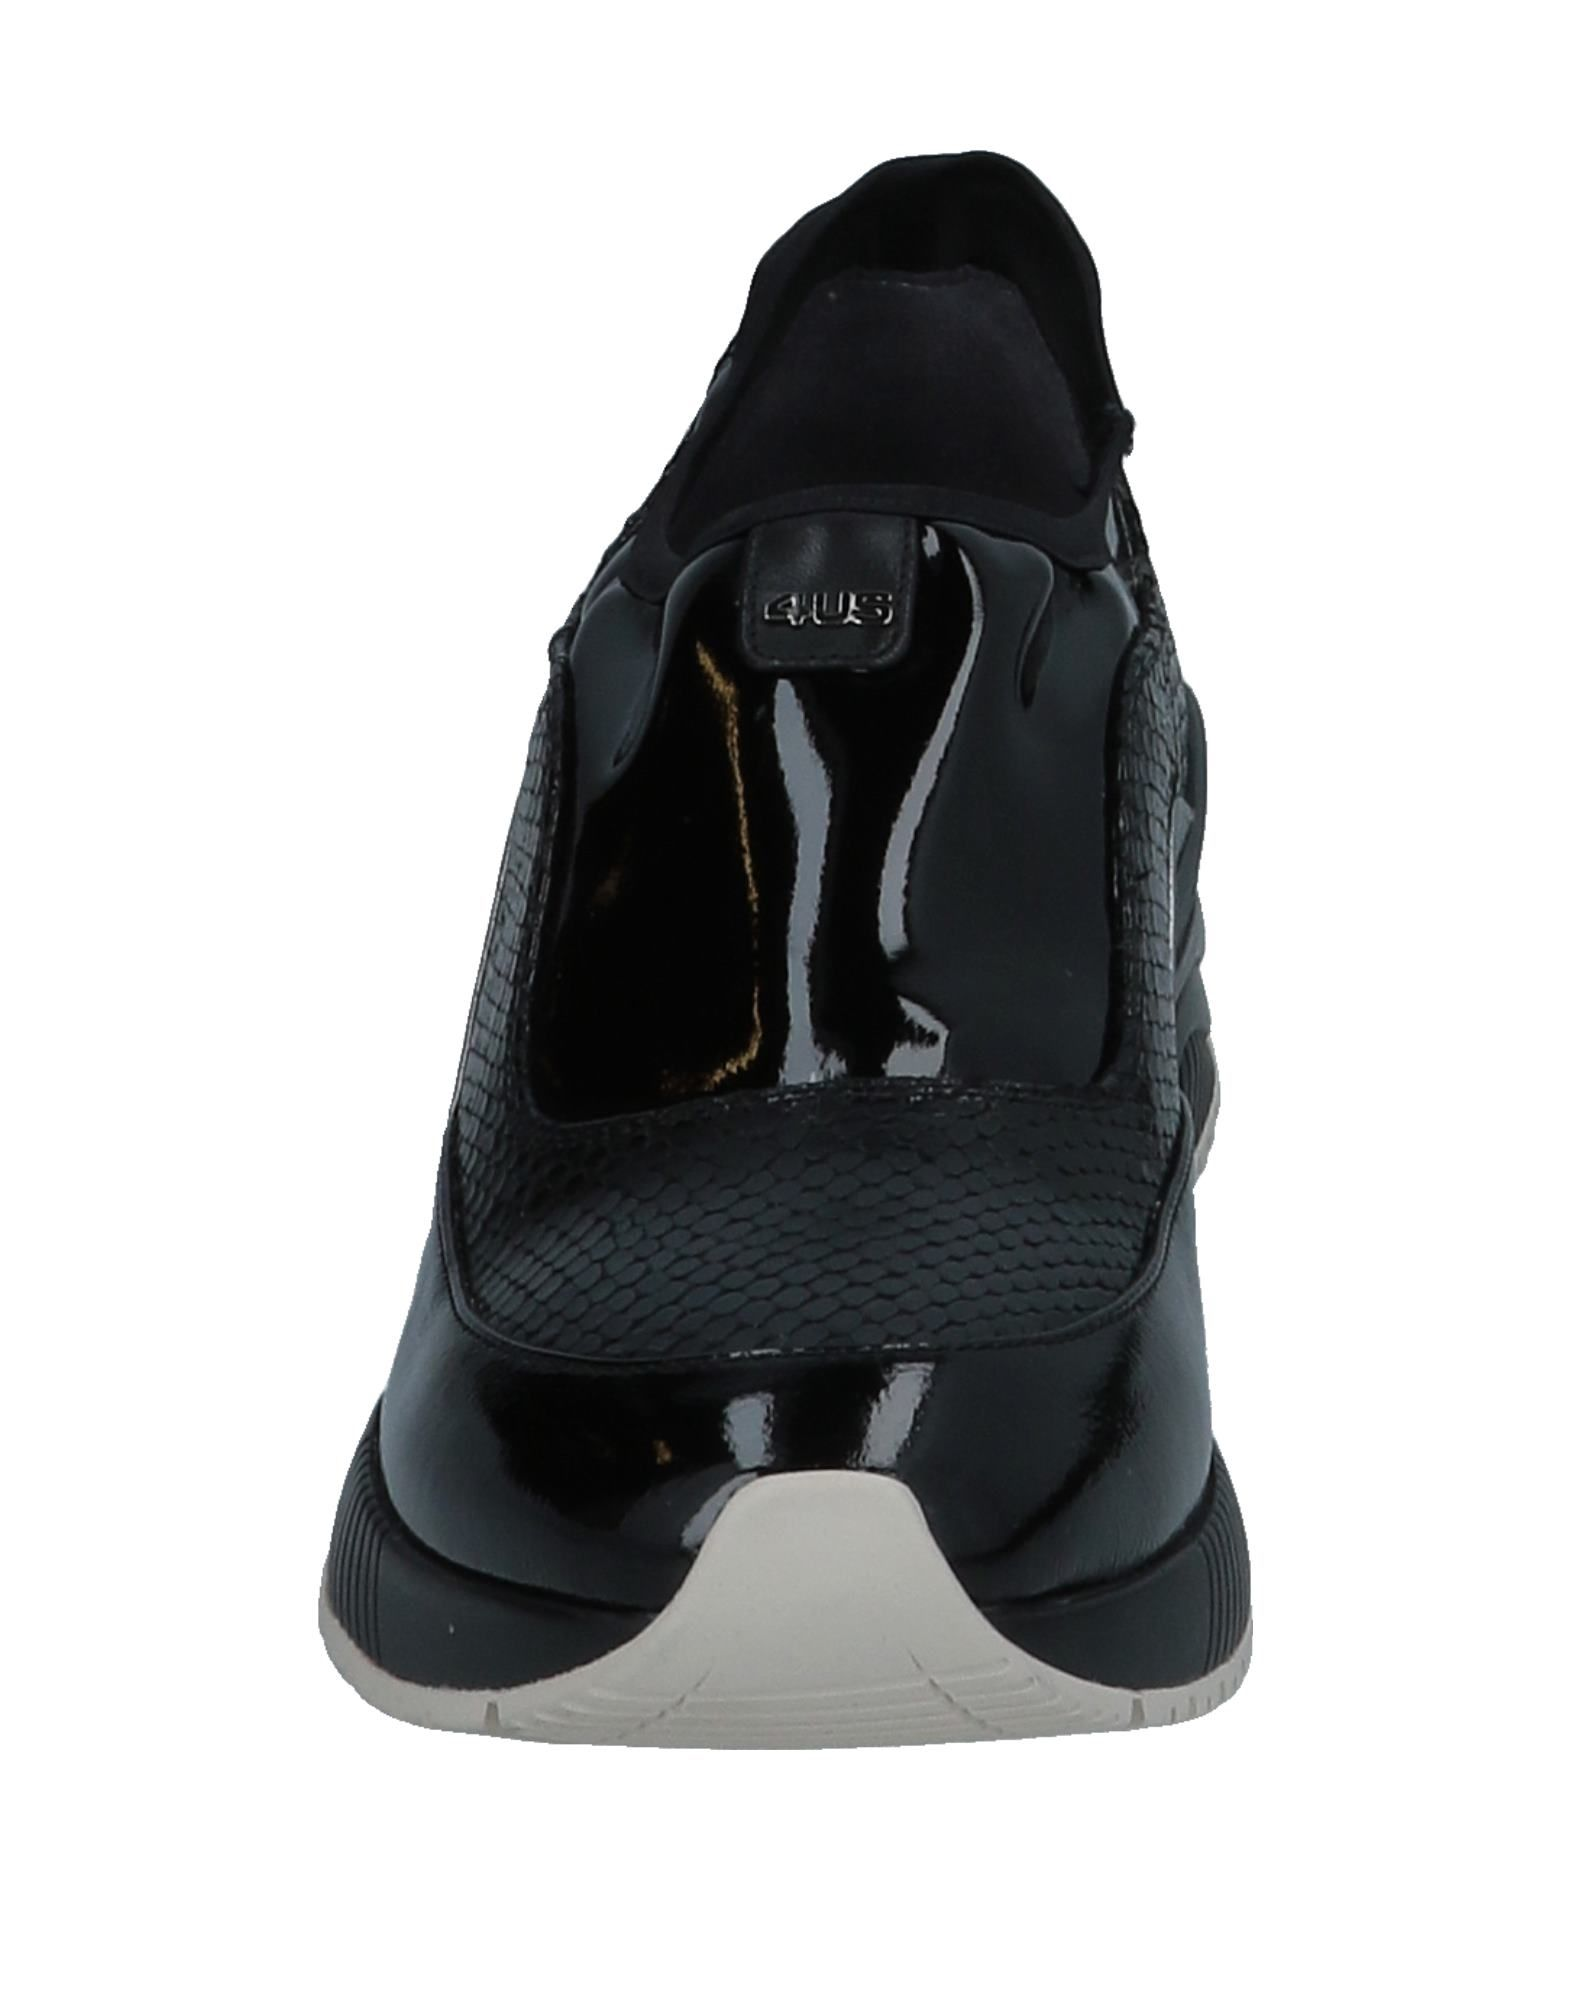 Stilvolle billige Schuhe Cesare Paciotti 4Us Sneakers Damen   Damen 11509387XX 6ad840